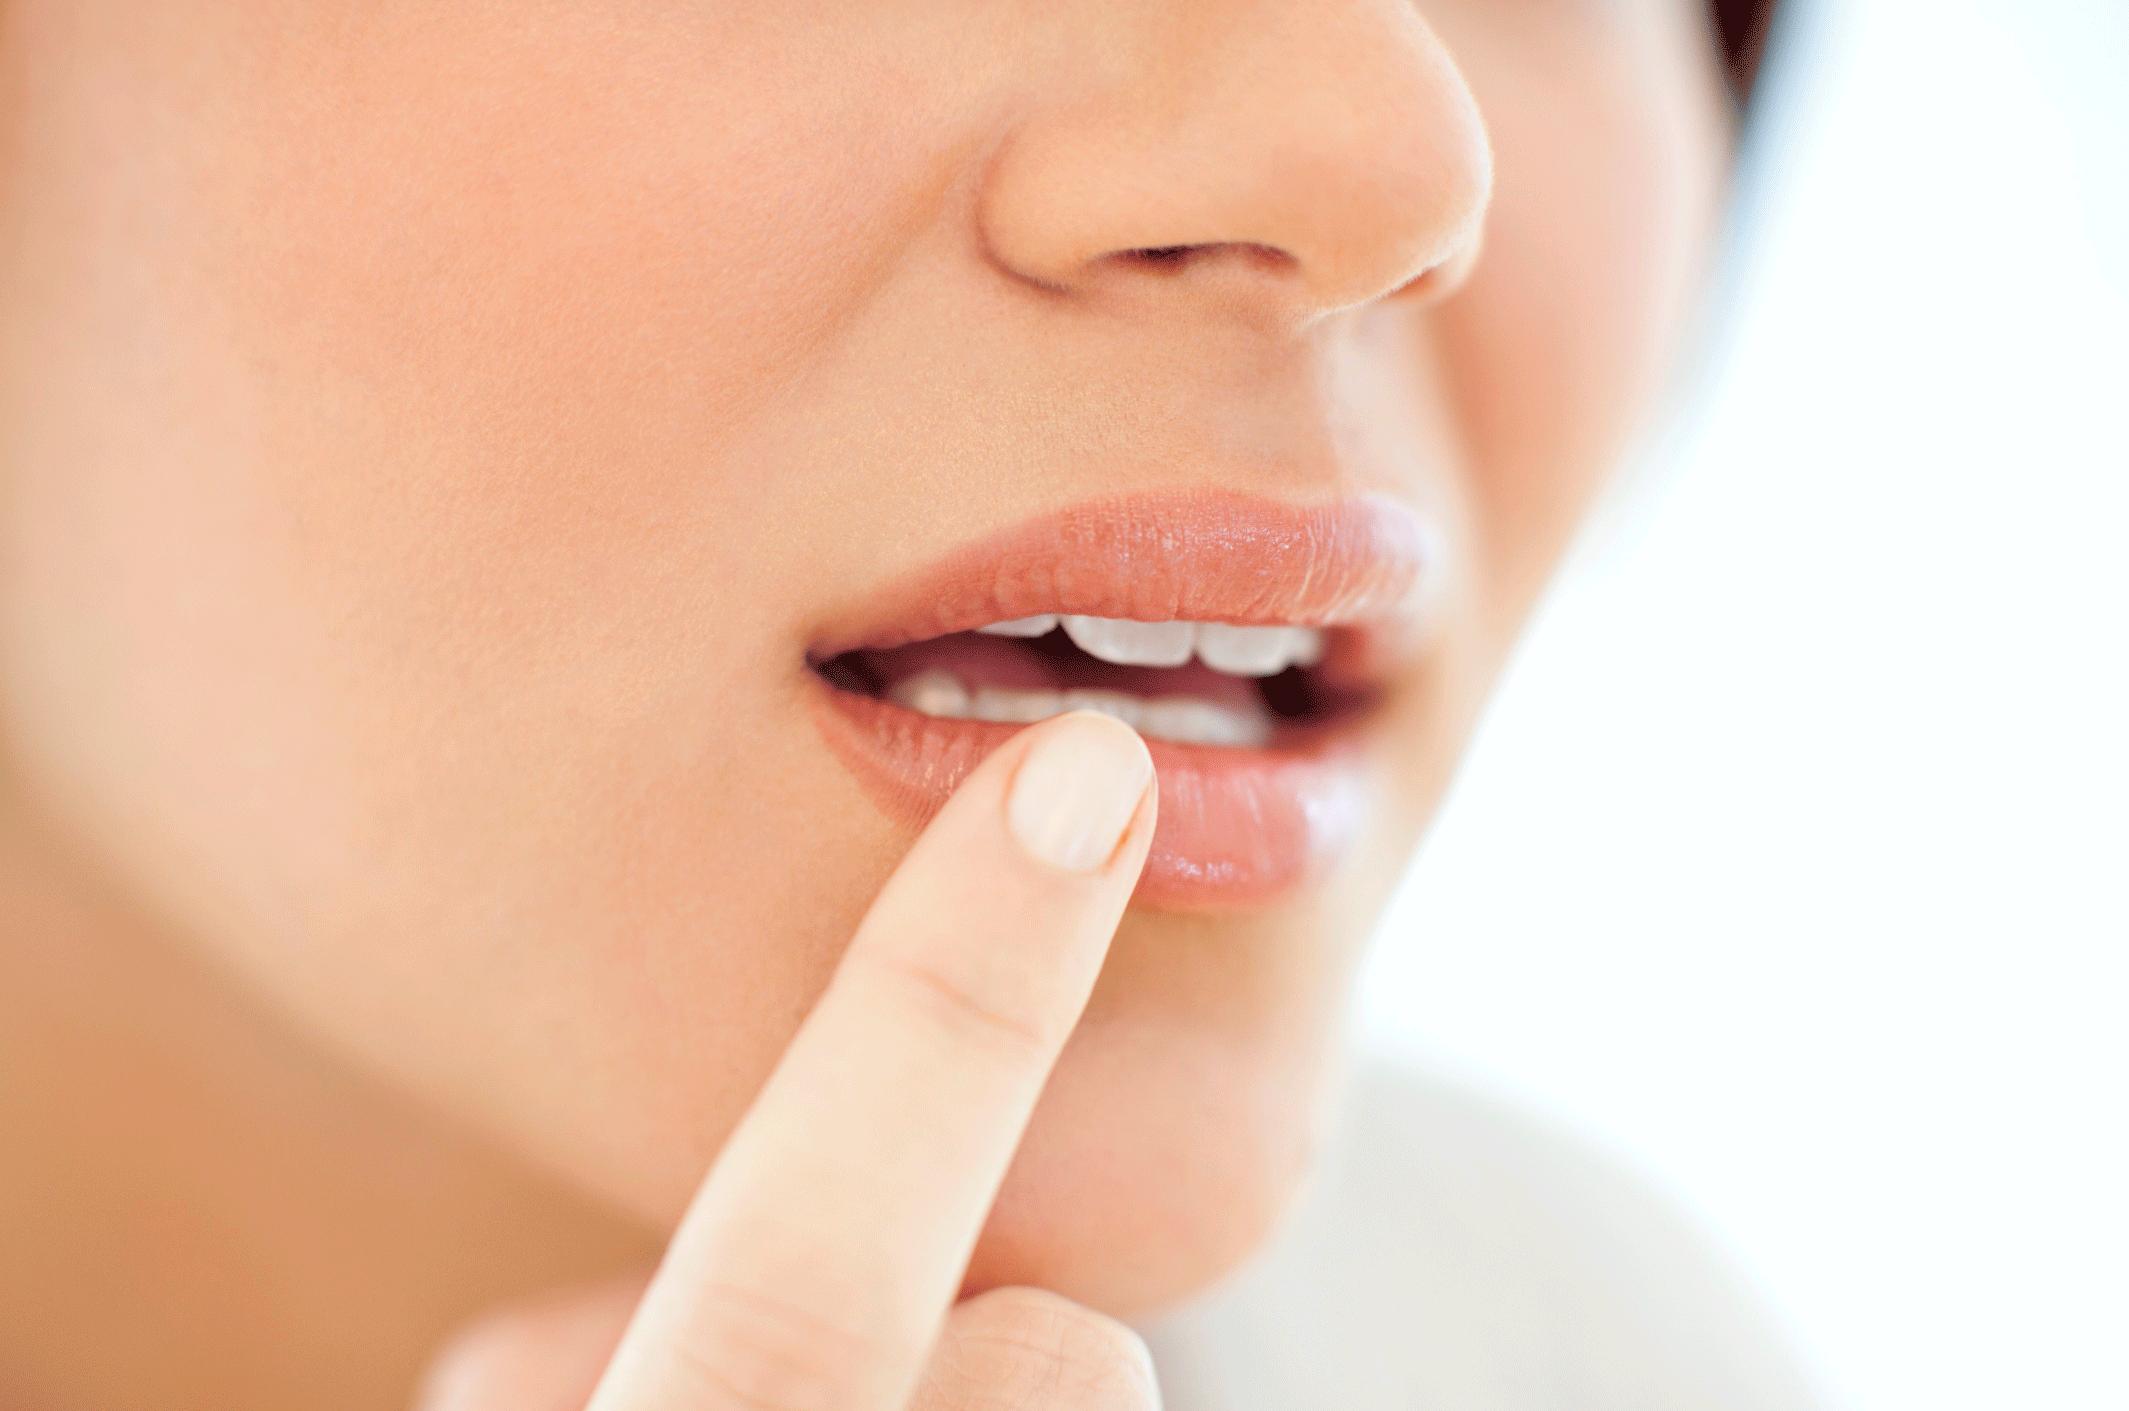 Lips home swollen remedies for Swollen Lips: